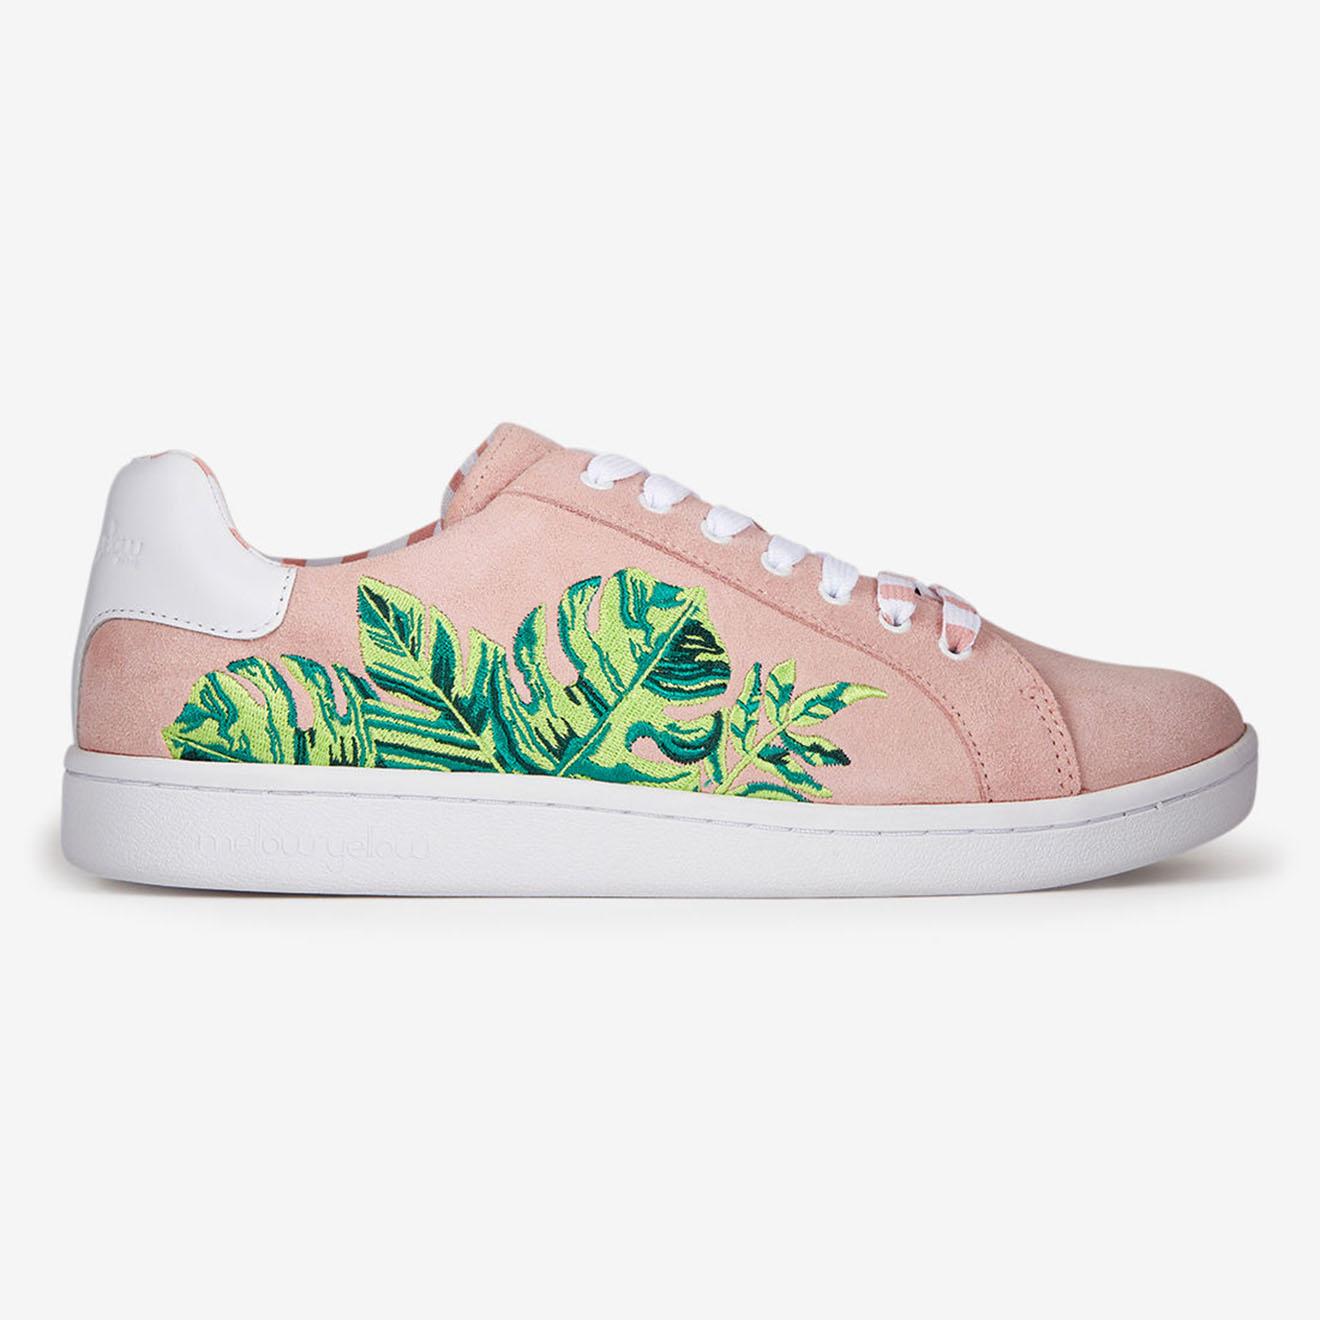 Sneakers en Velours de Cuir Faleaf roses - Mellow Yellow - Modalova